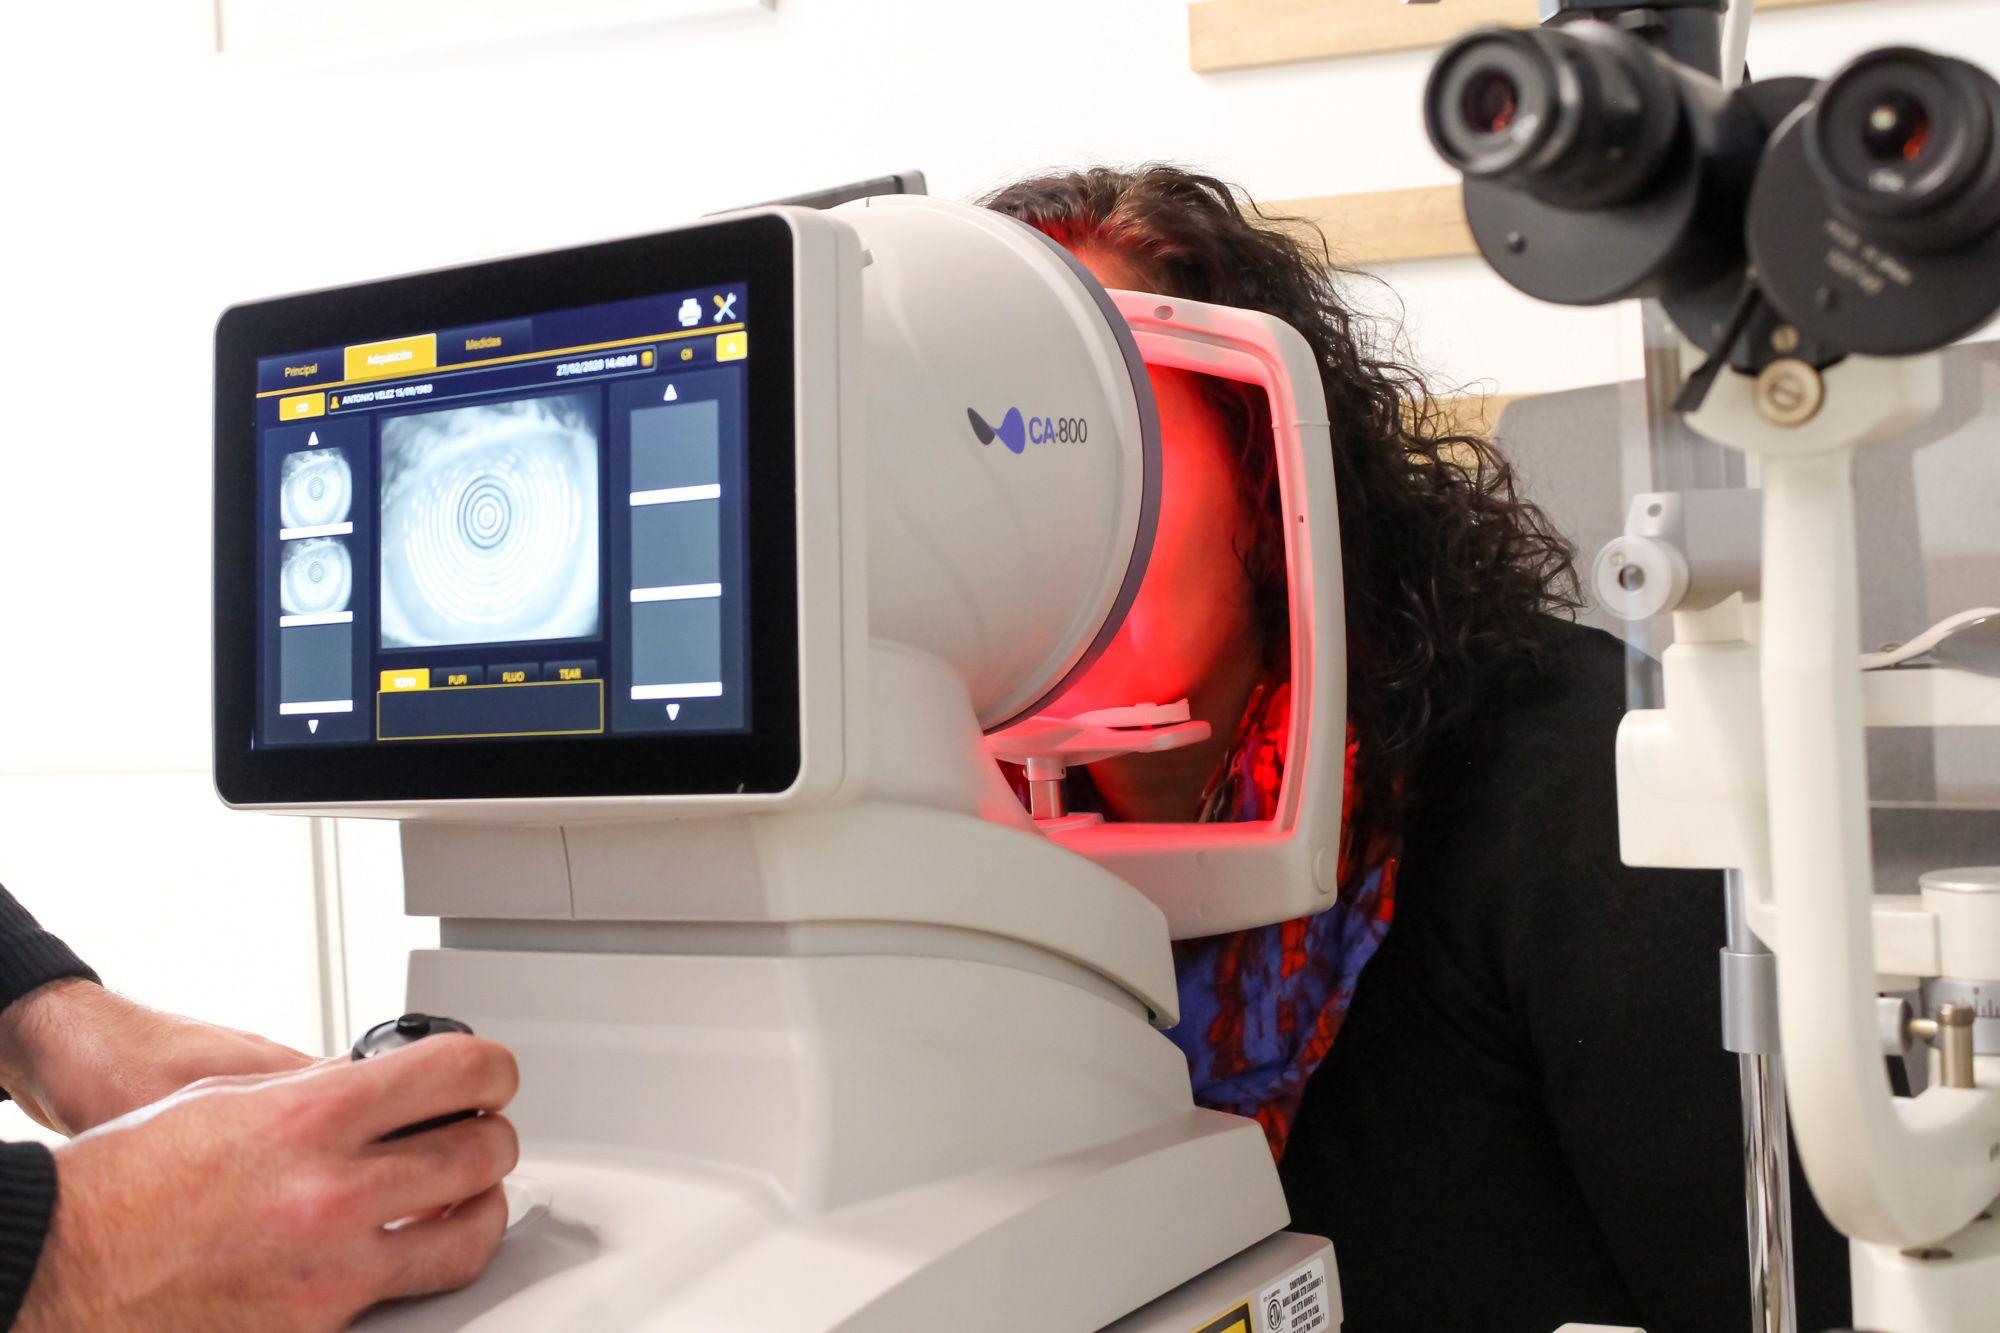 Maquinaria para revisiones oculares